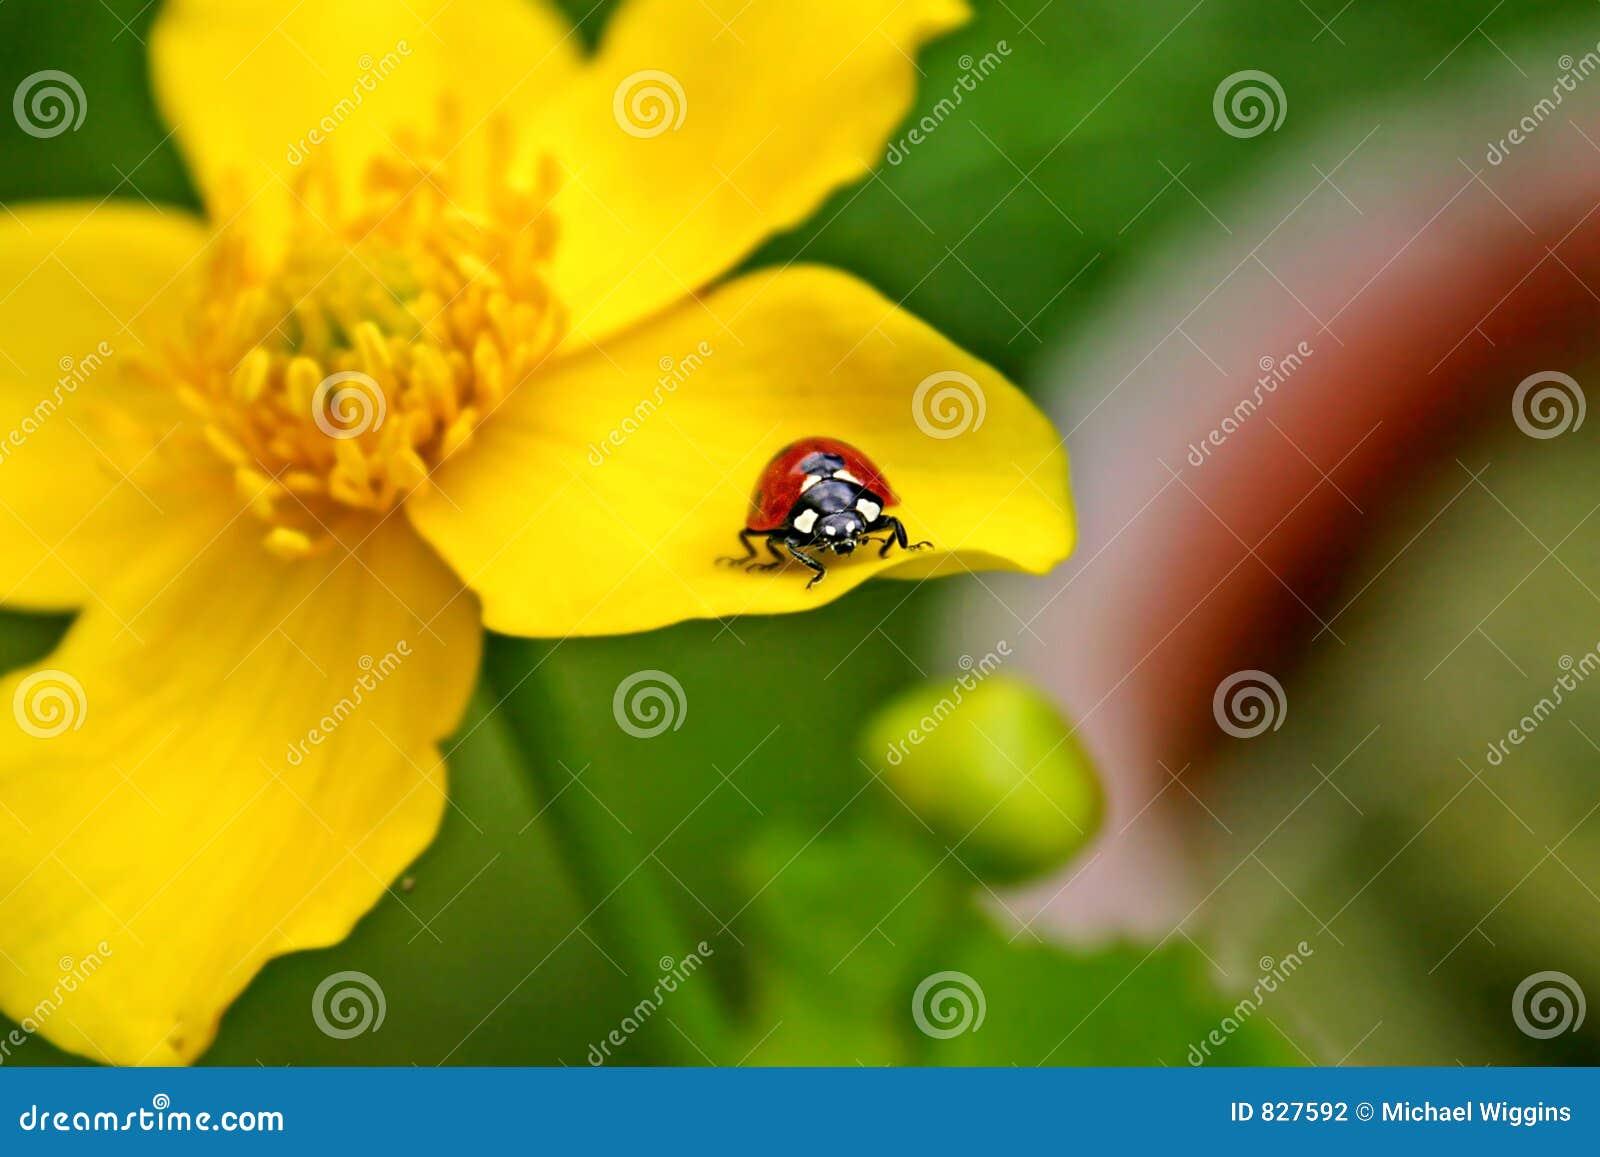 Lady Bird on yellow bloom